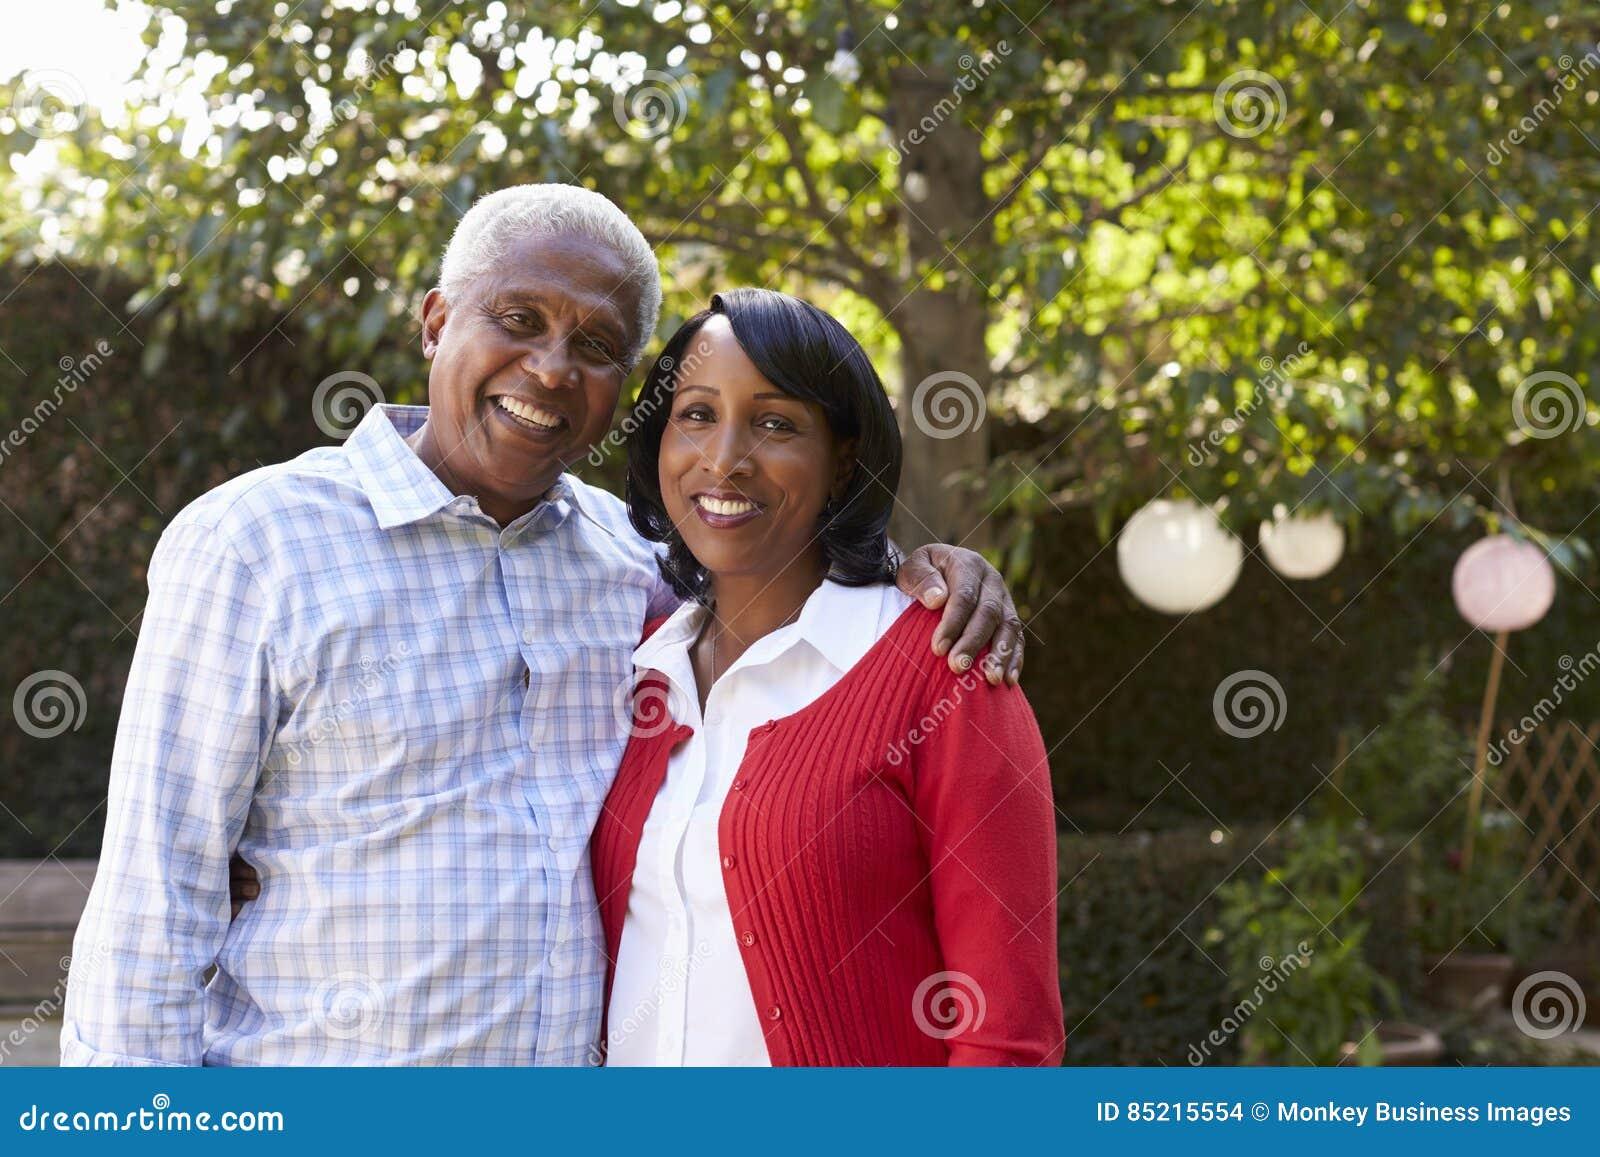 Senior black dating